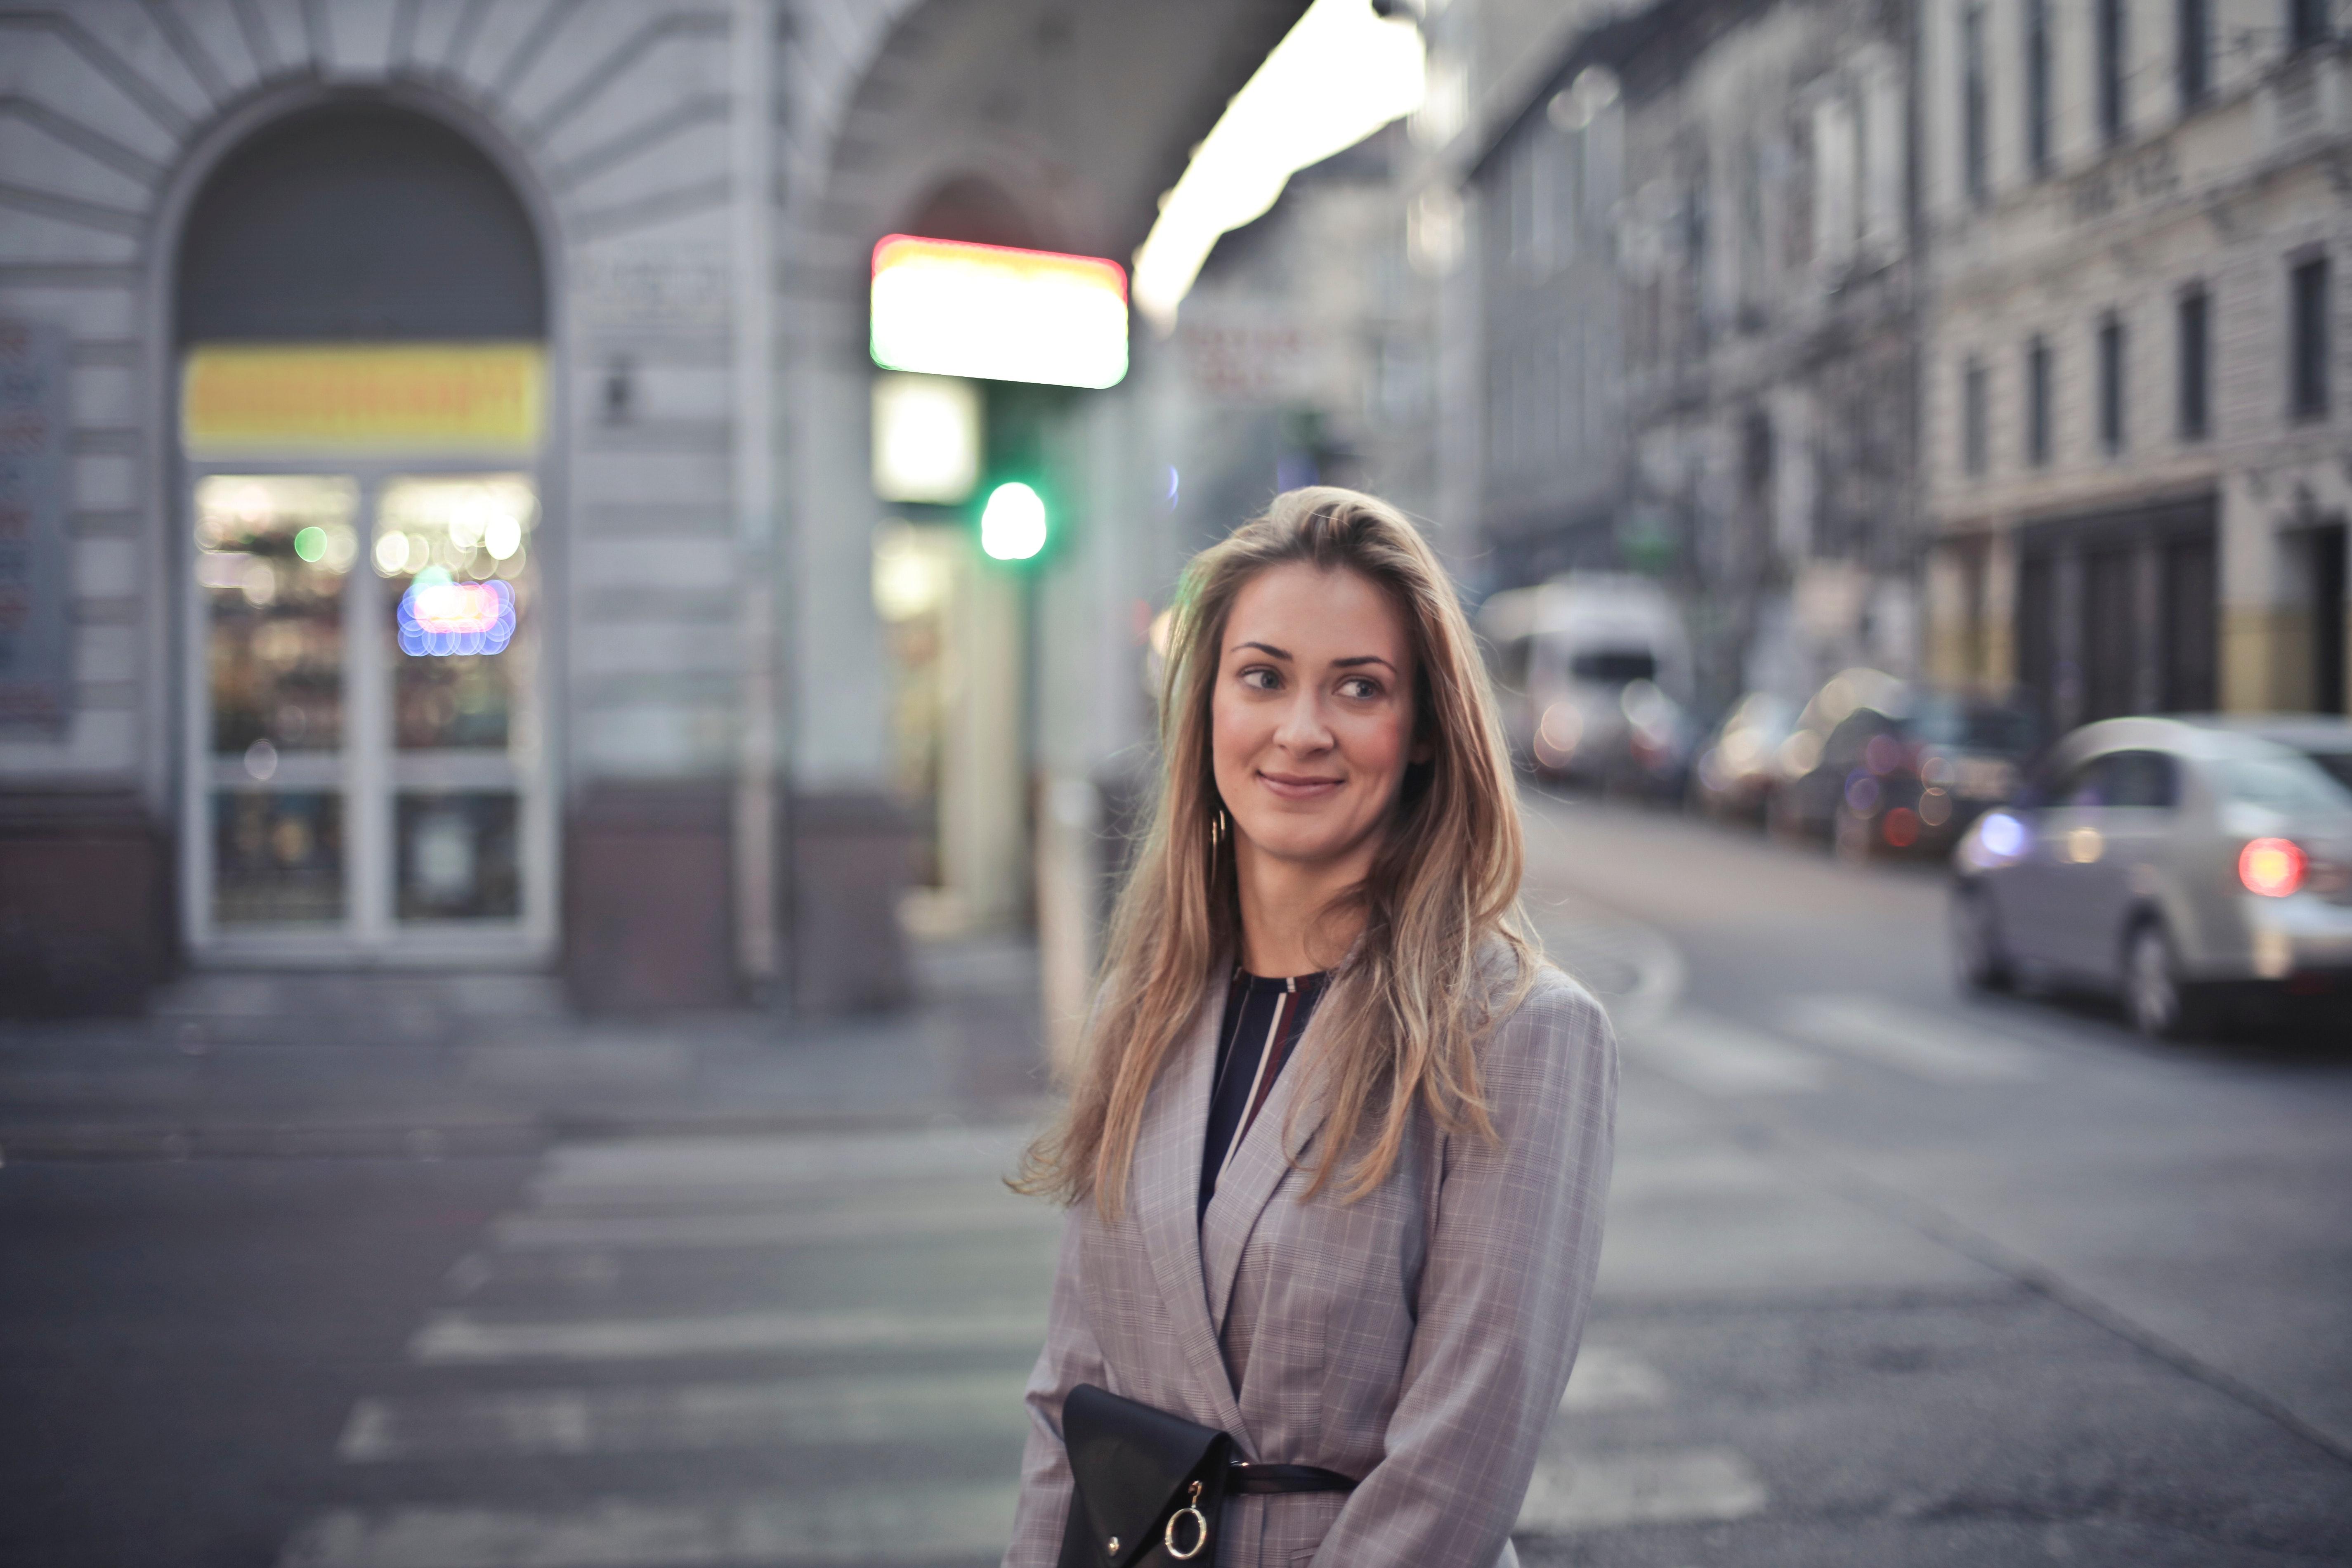 woman-in-gray-suit-jacket-near-gray-car-825990 - Copia